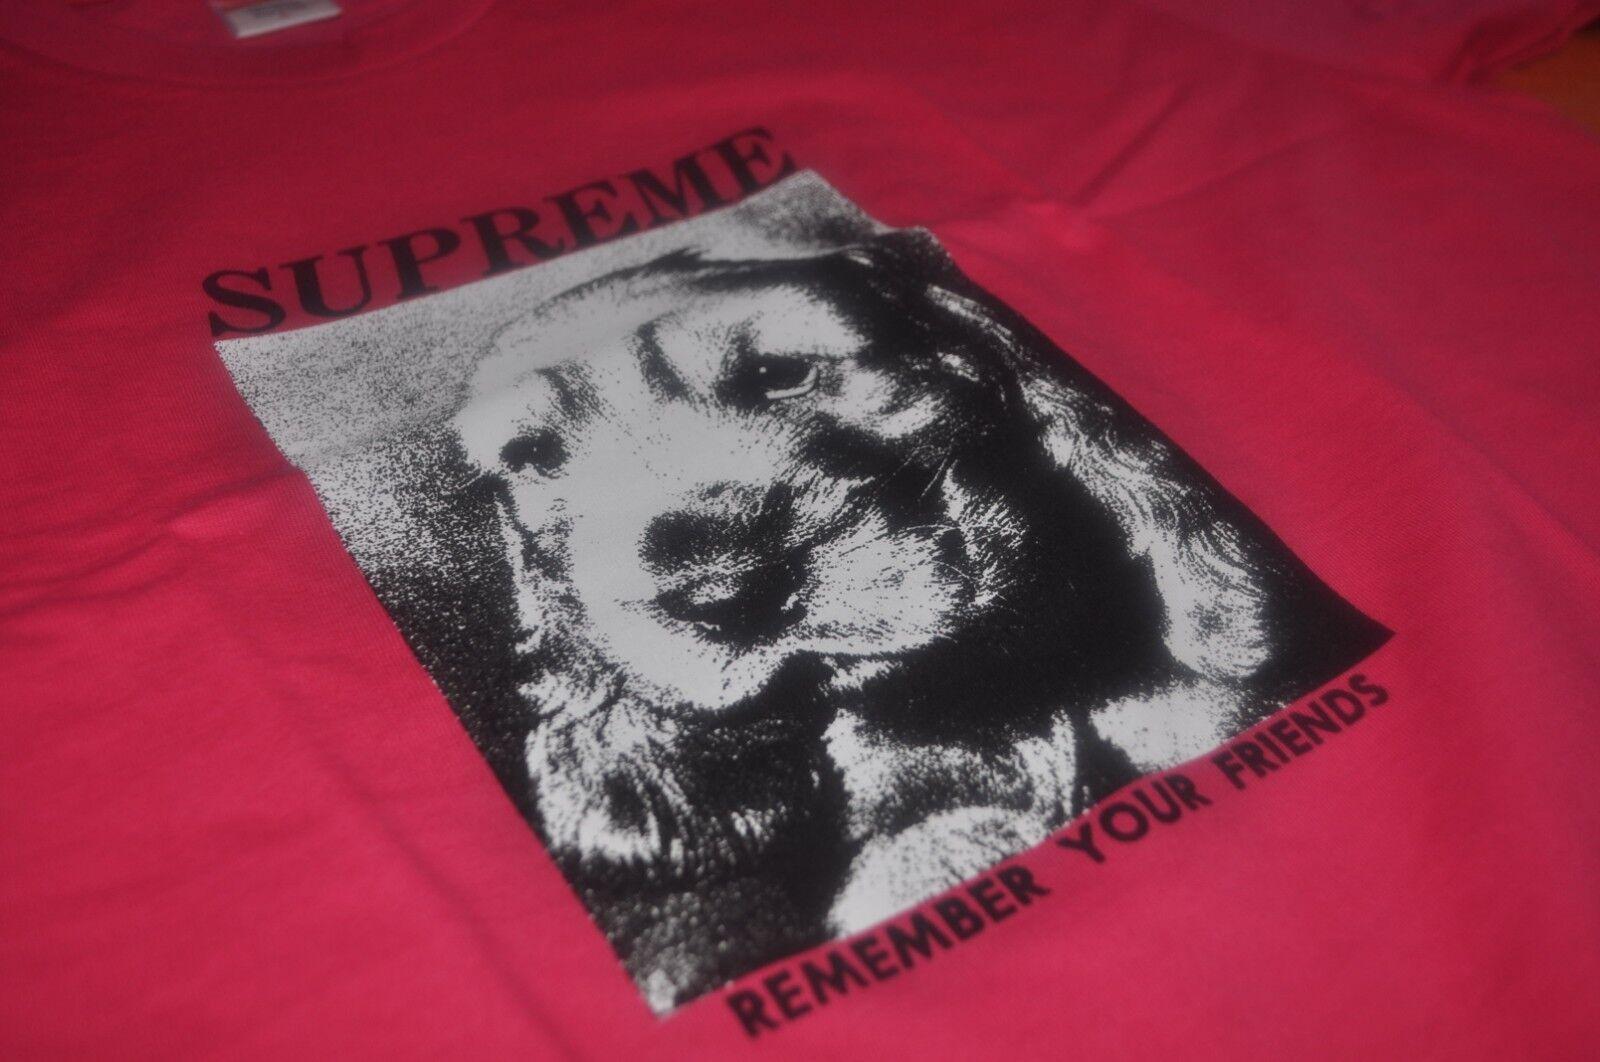 Supreme Dog Dog Dog T-shirt rosa Taglia Large L MADONNA LA VITA DI LOGO a76b01